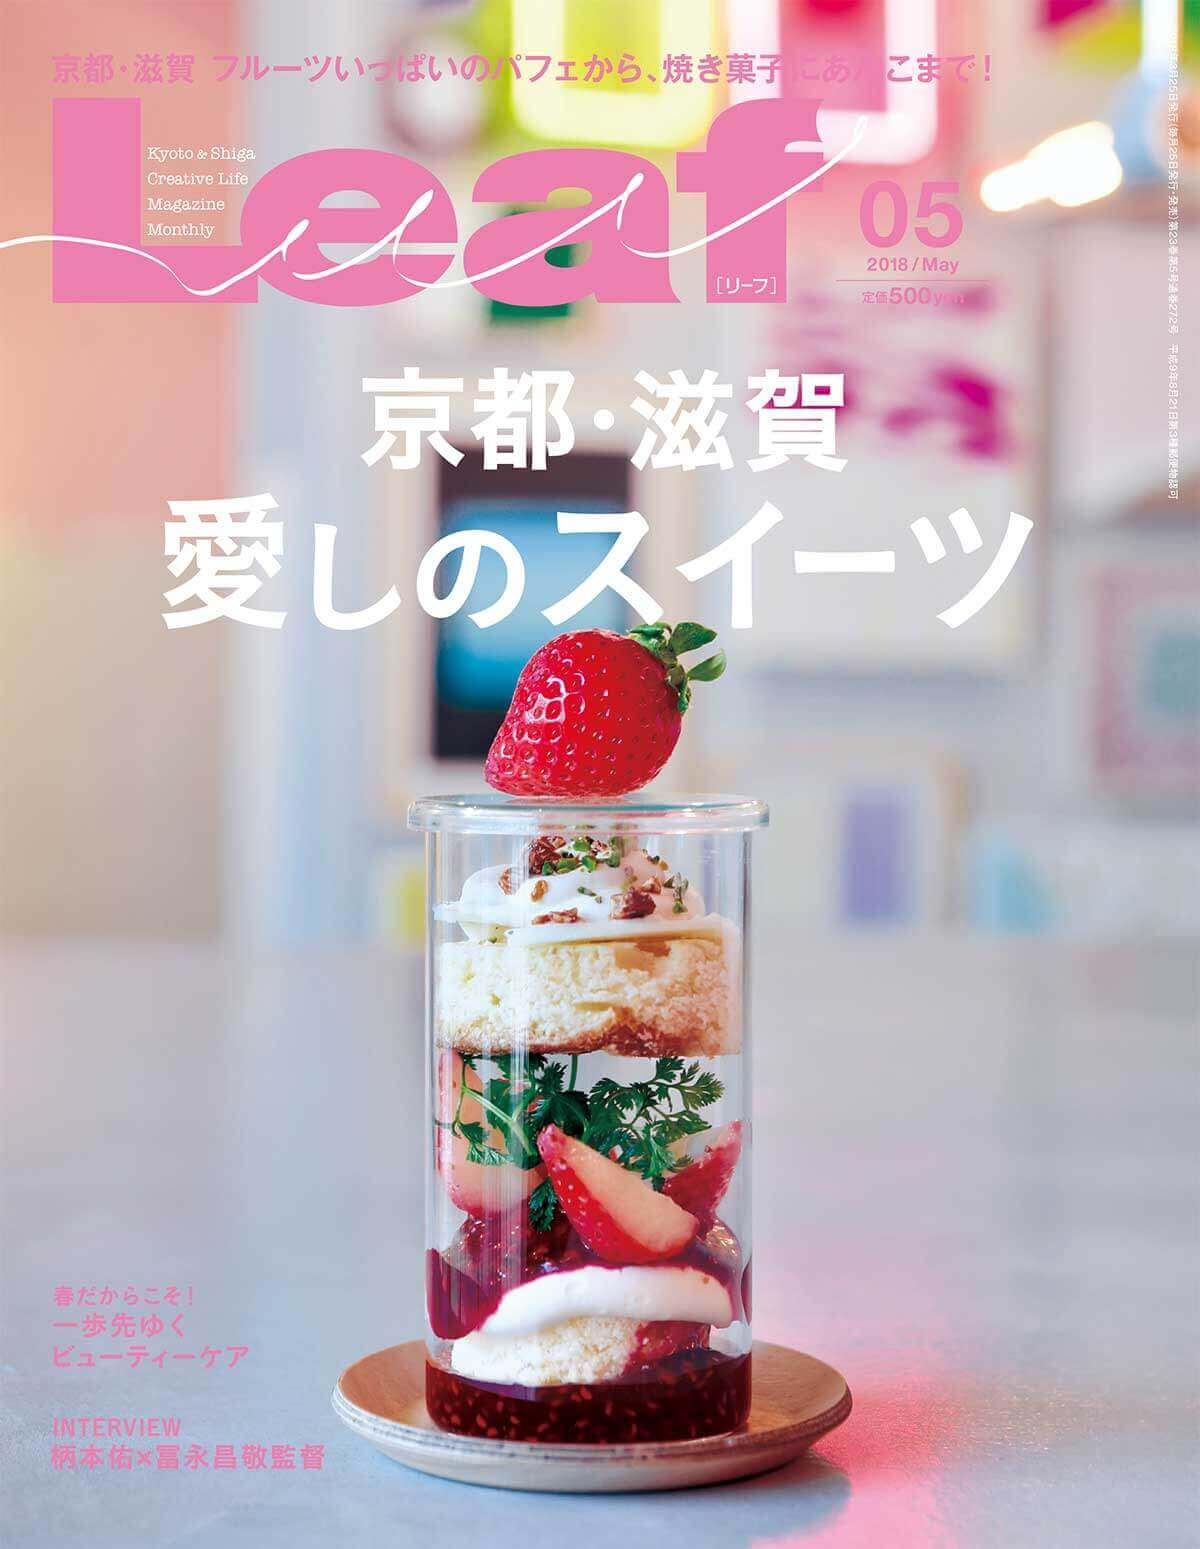 Leaf - 京都・滋賀 愛しのスイーツ